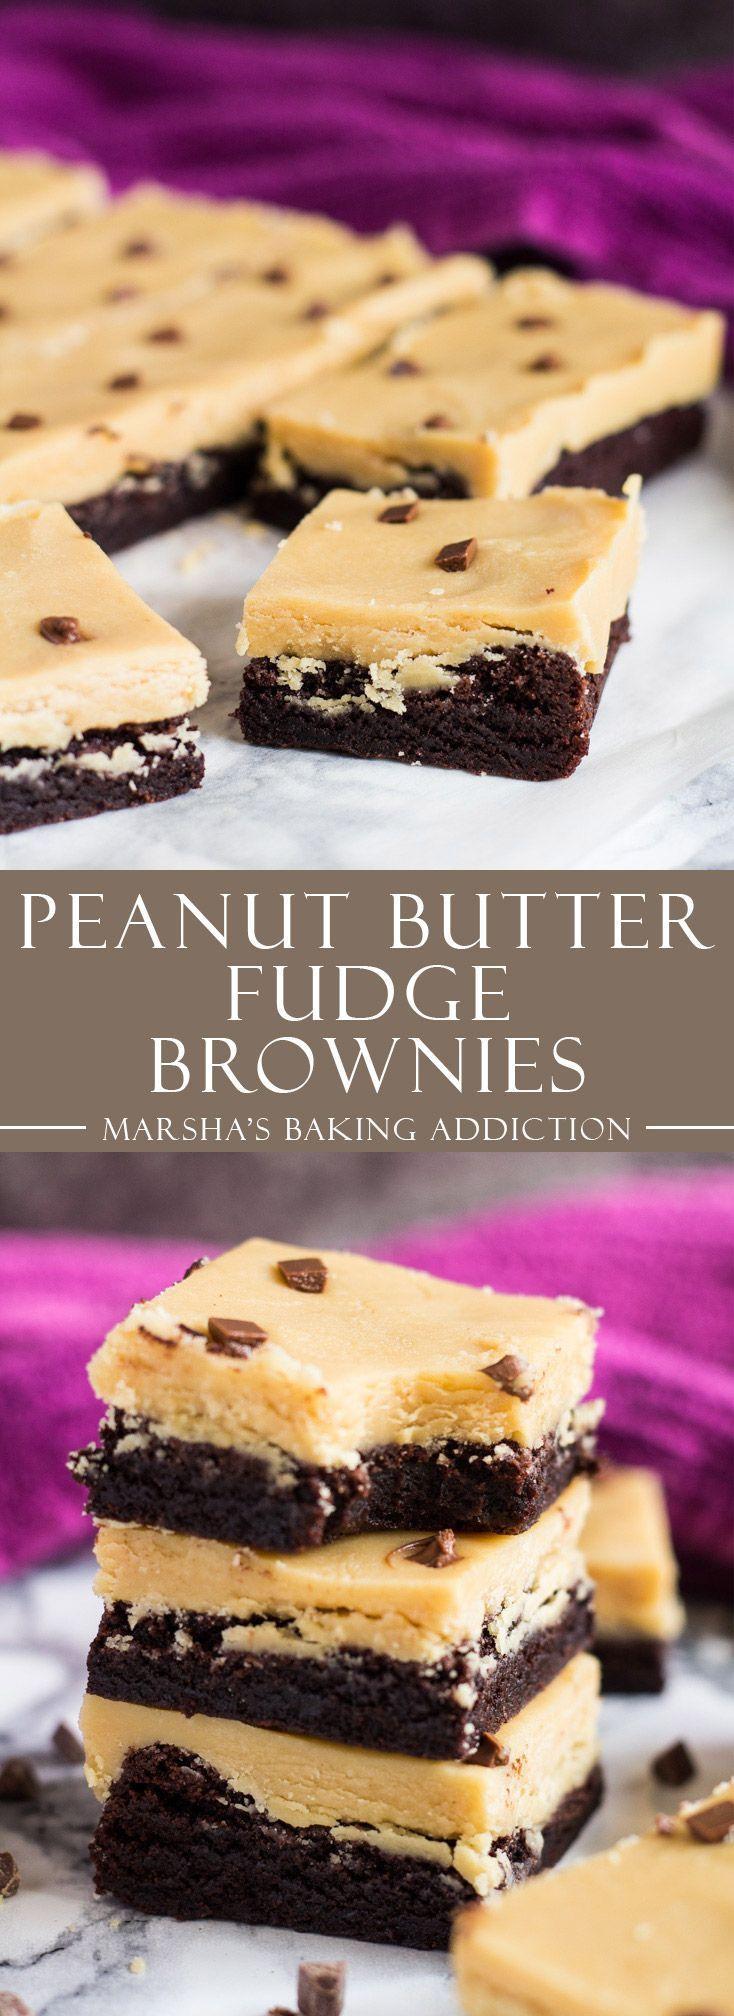 Peanut Butter Fudge Brownies   http://marshasbakingaddiction.com /marshasbakeblog/